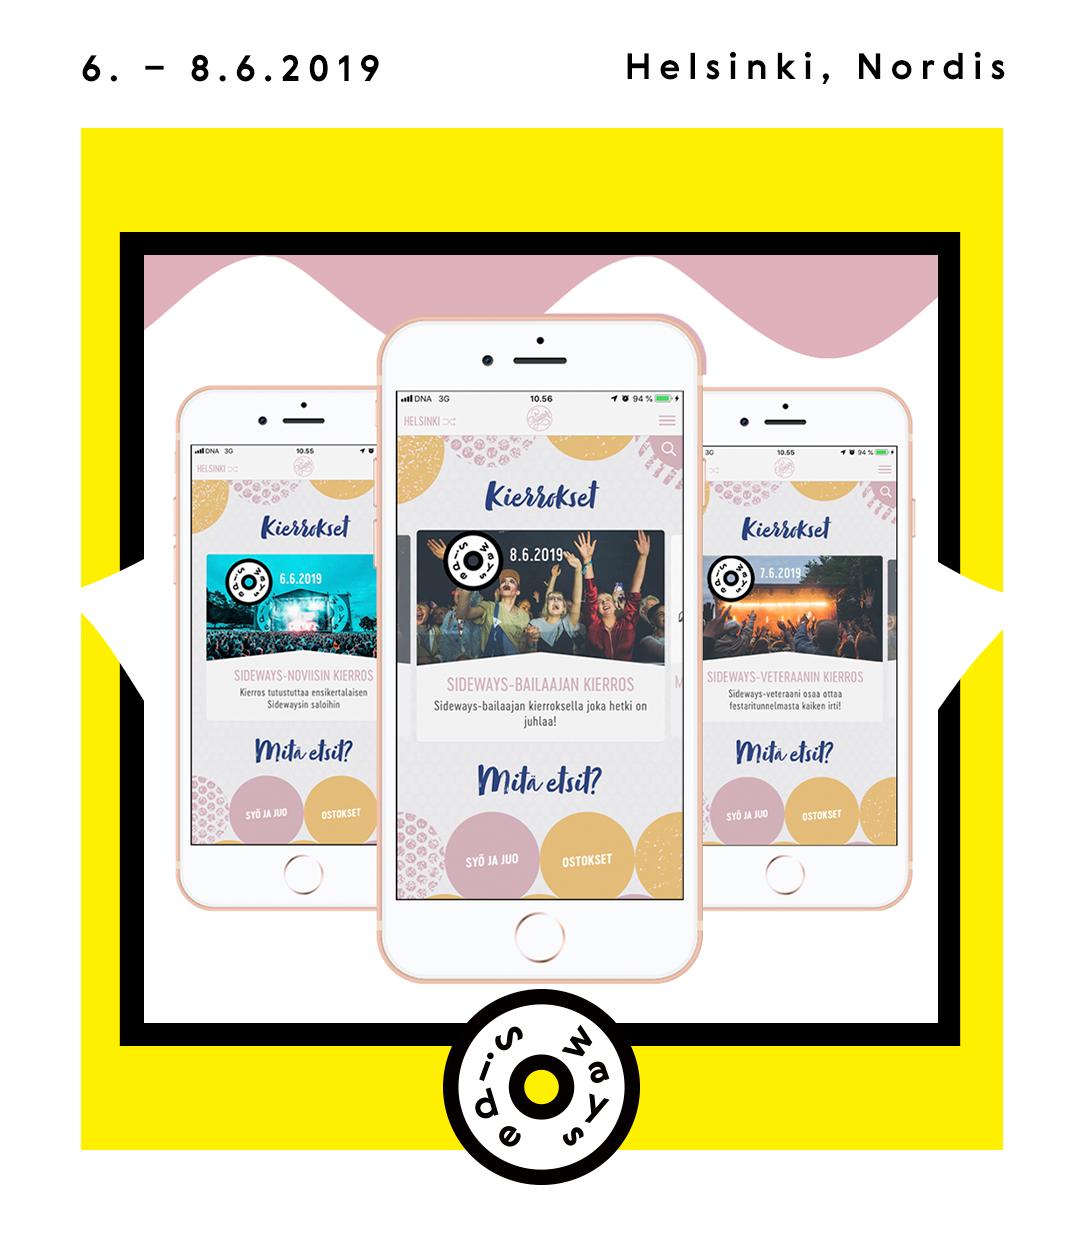 Sideways-kierrokset / Tripsteri App